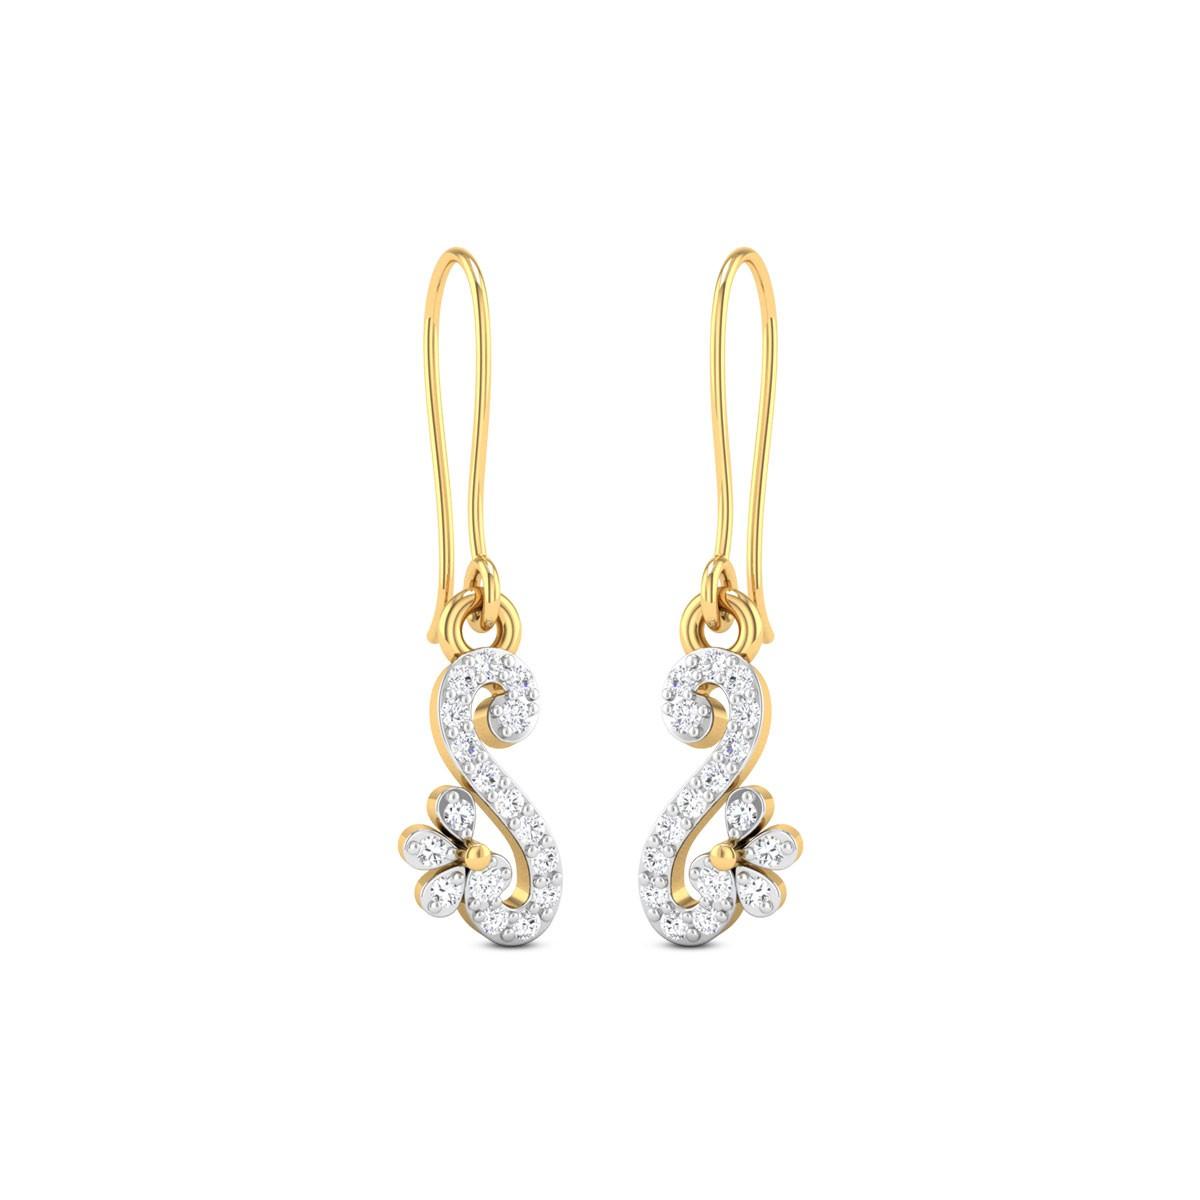 Zana Diamond Earrings